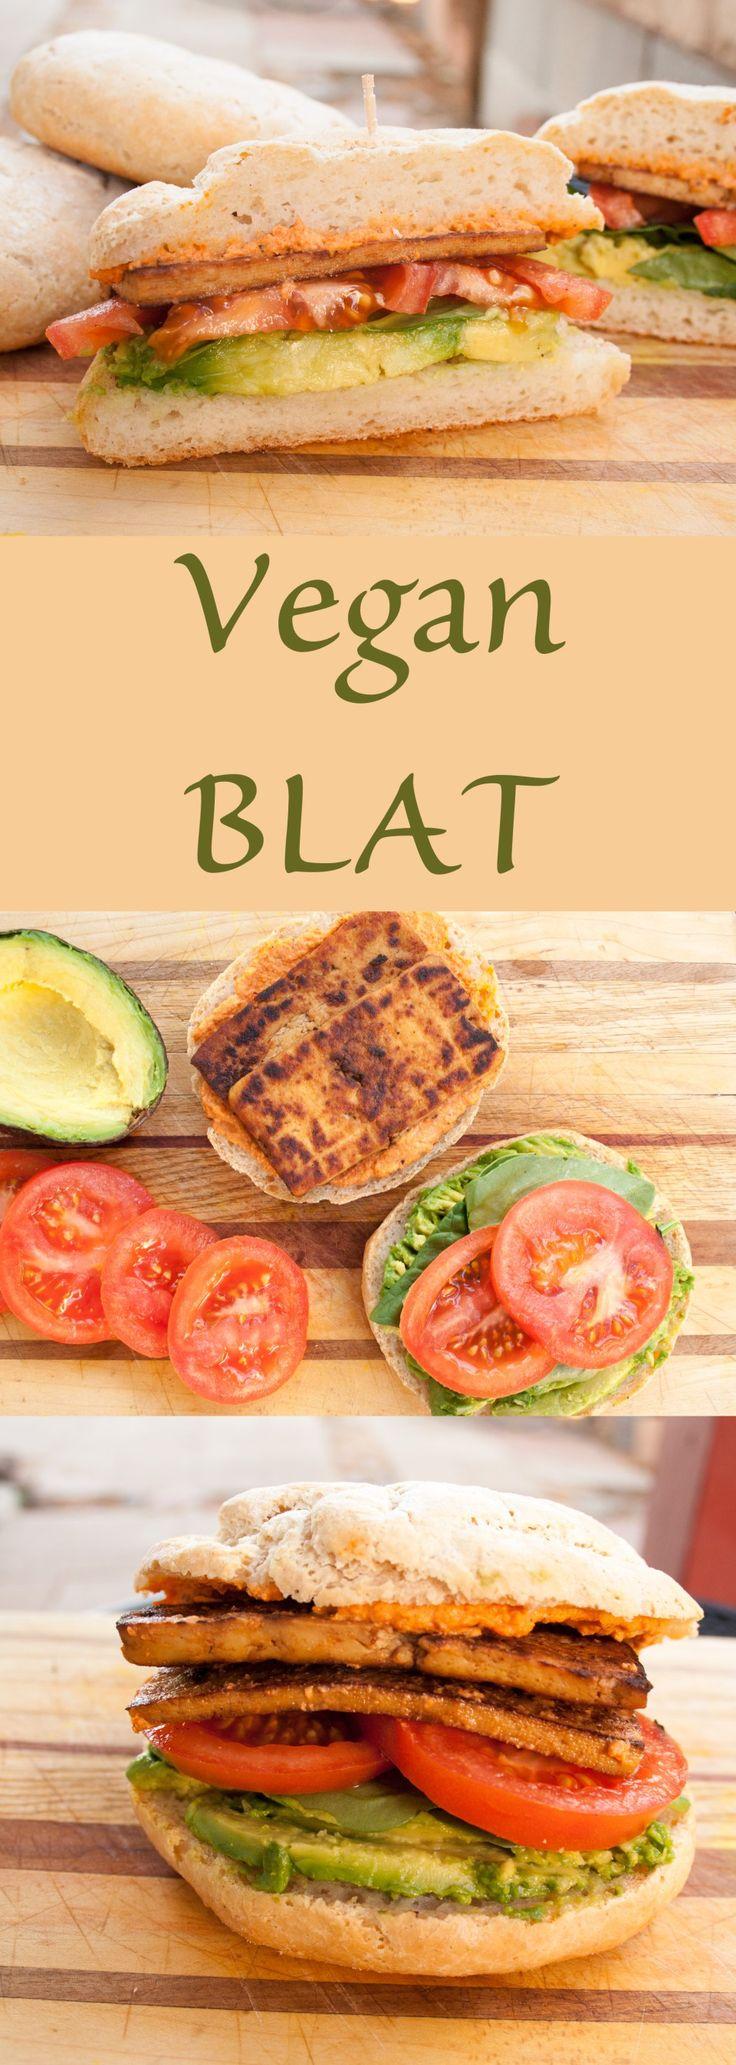 Vegan BLAT - This vegan sandwich is so good, you won't miss the bacon!